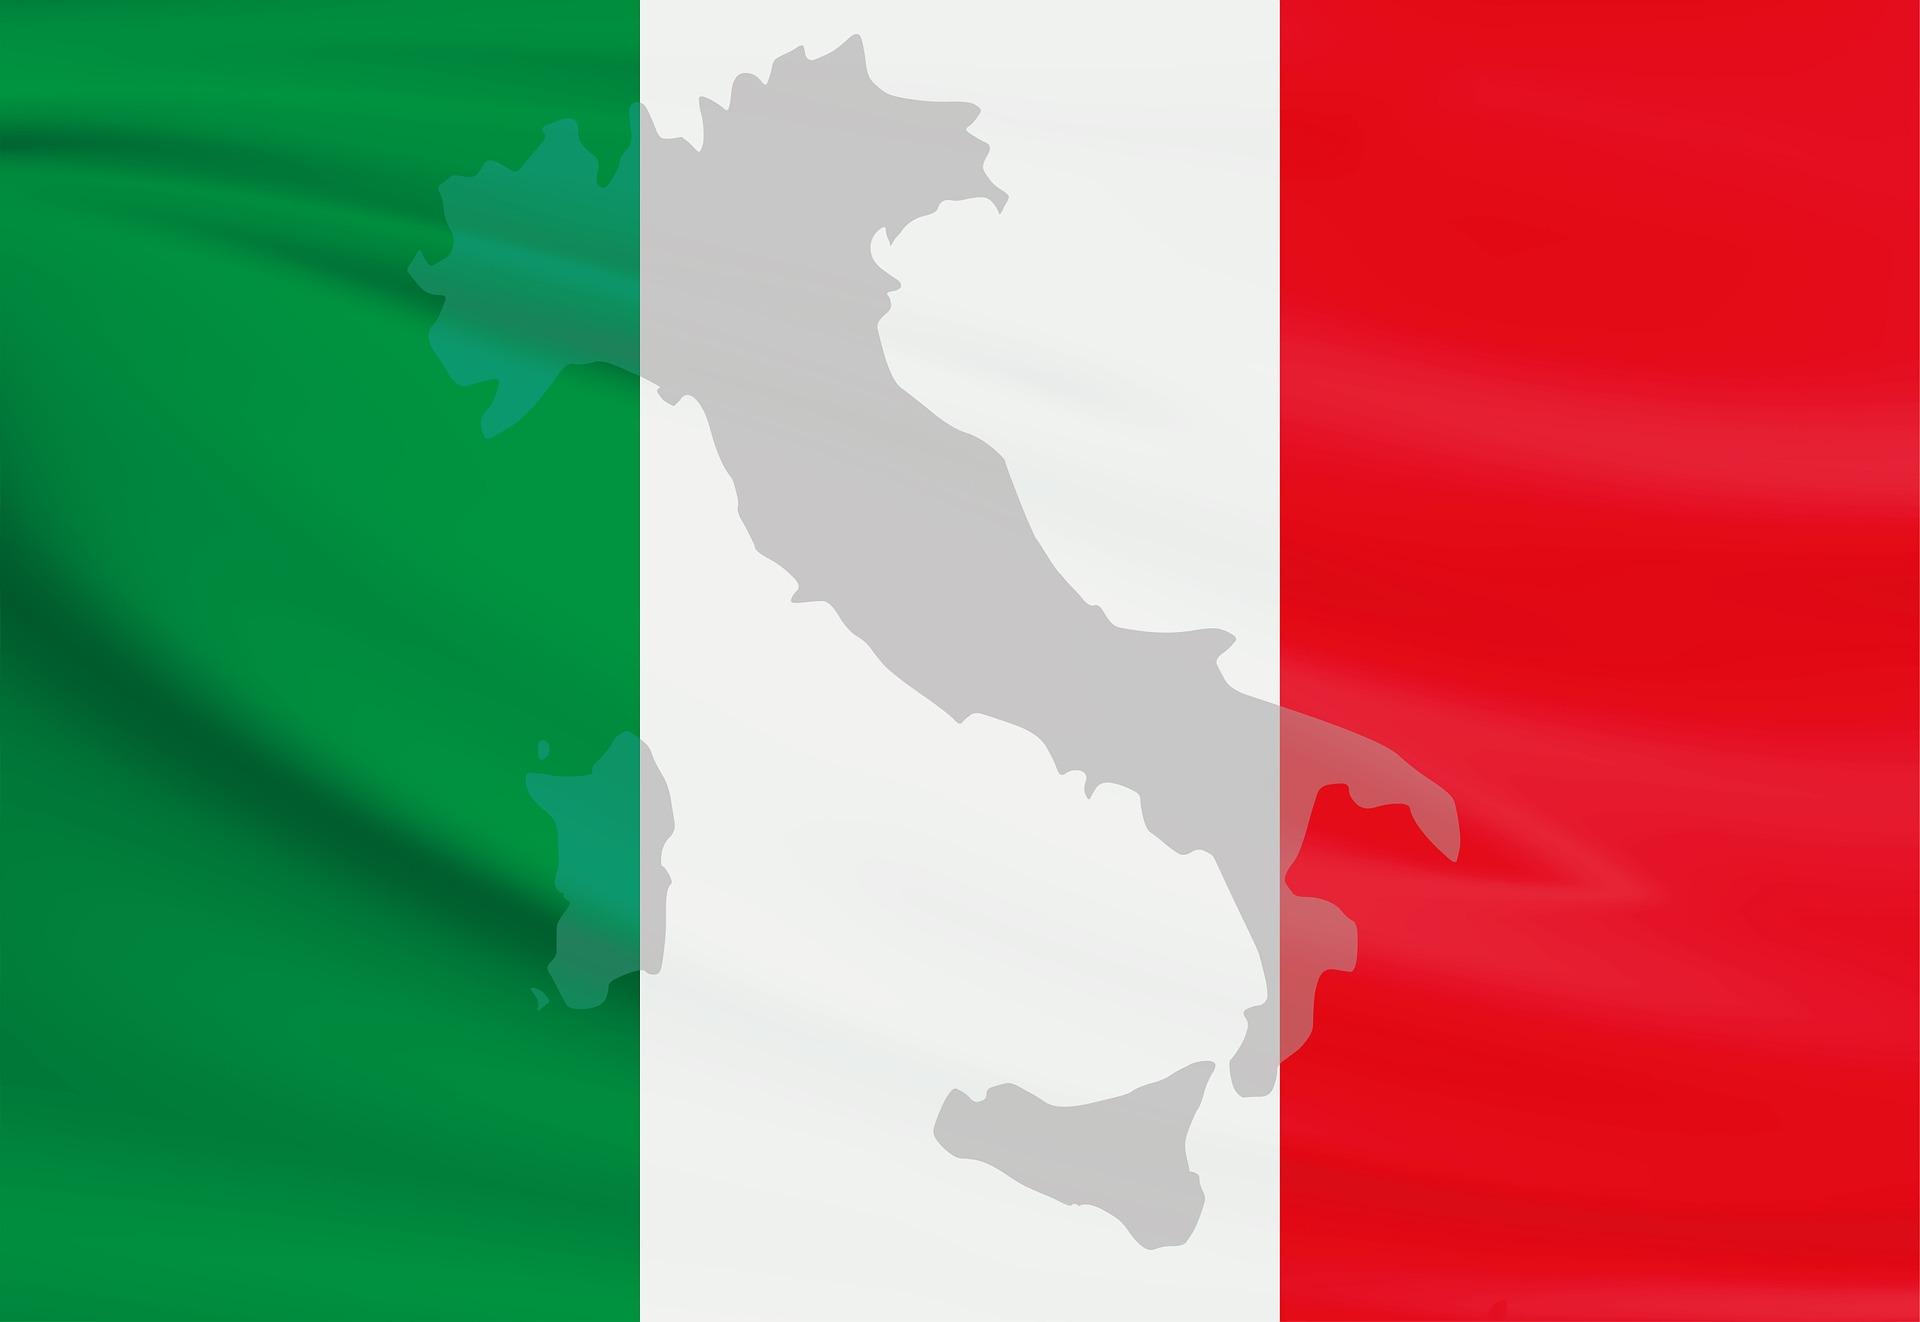 Drapeau et carte Italie